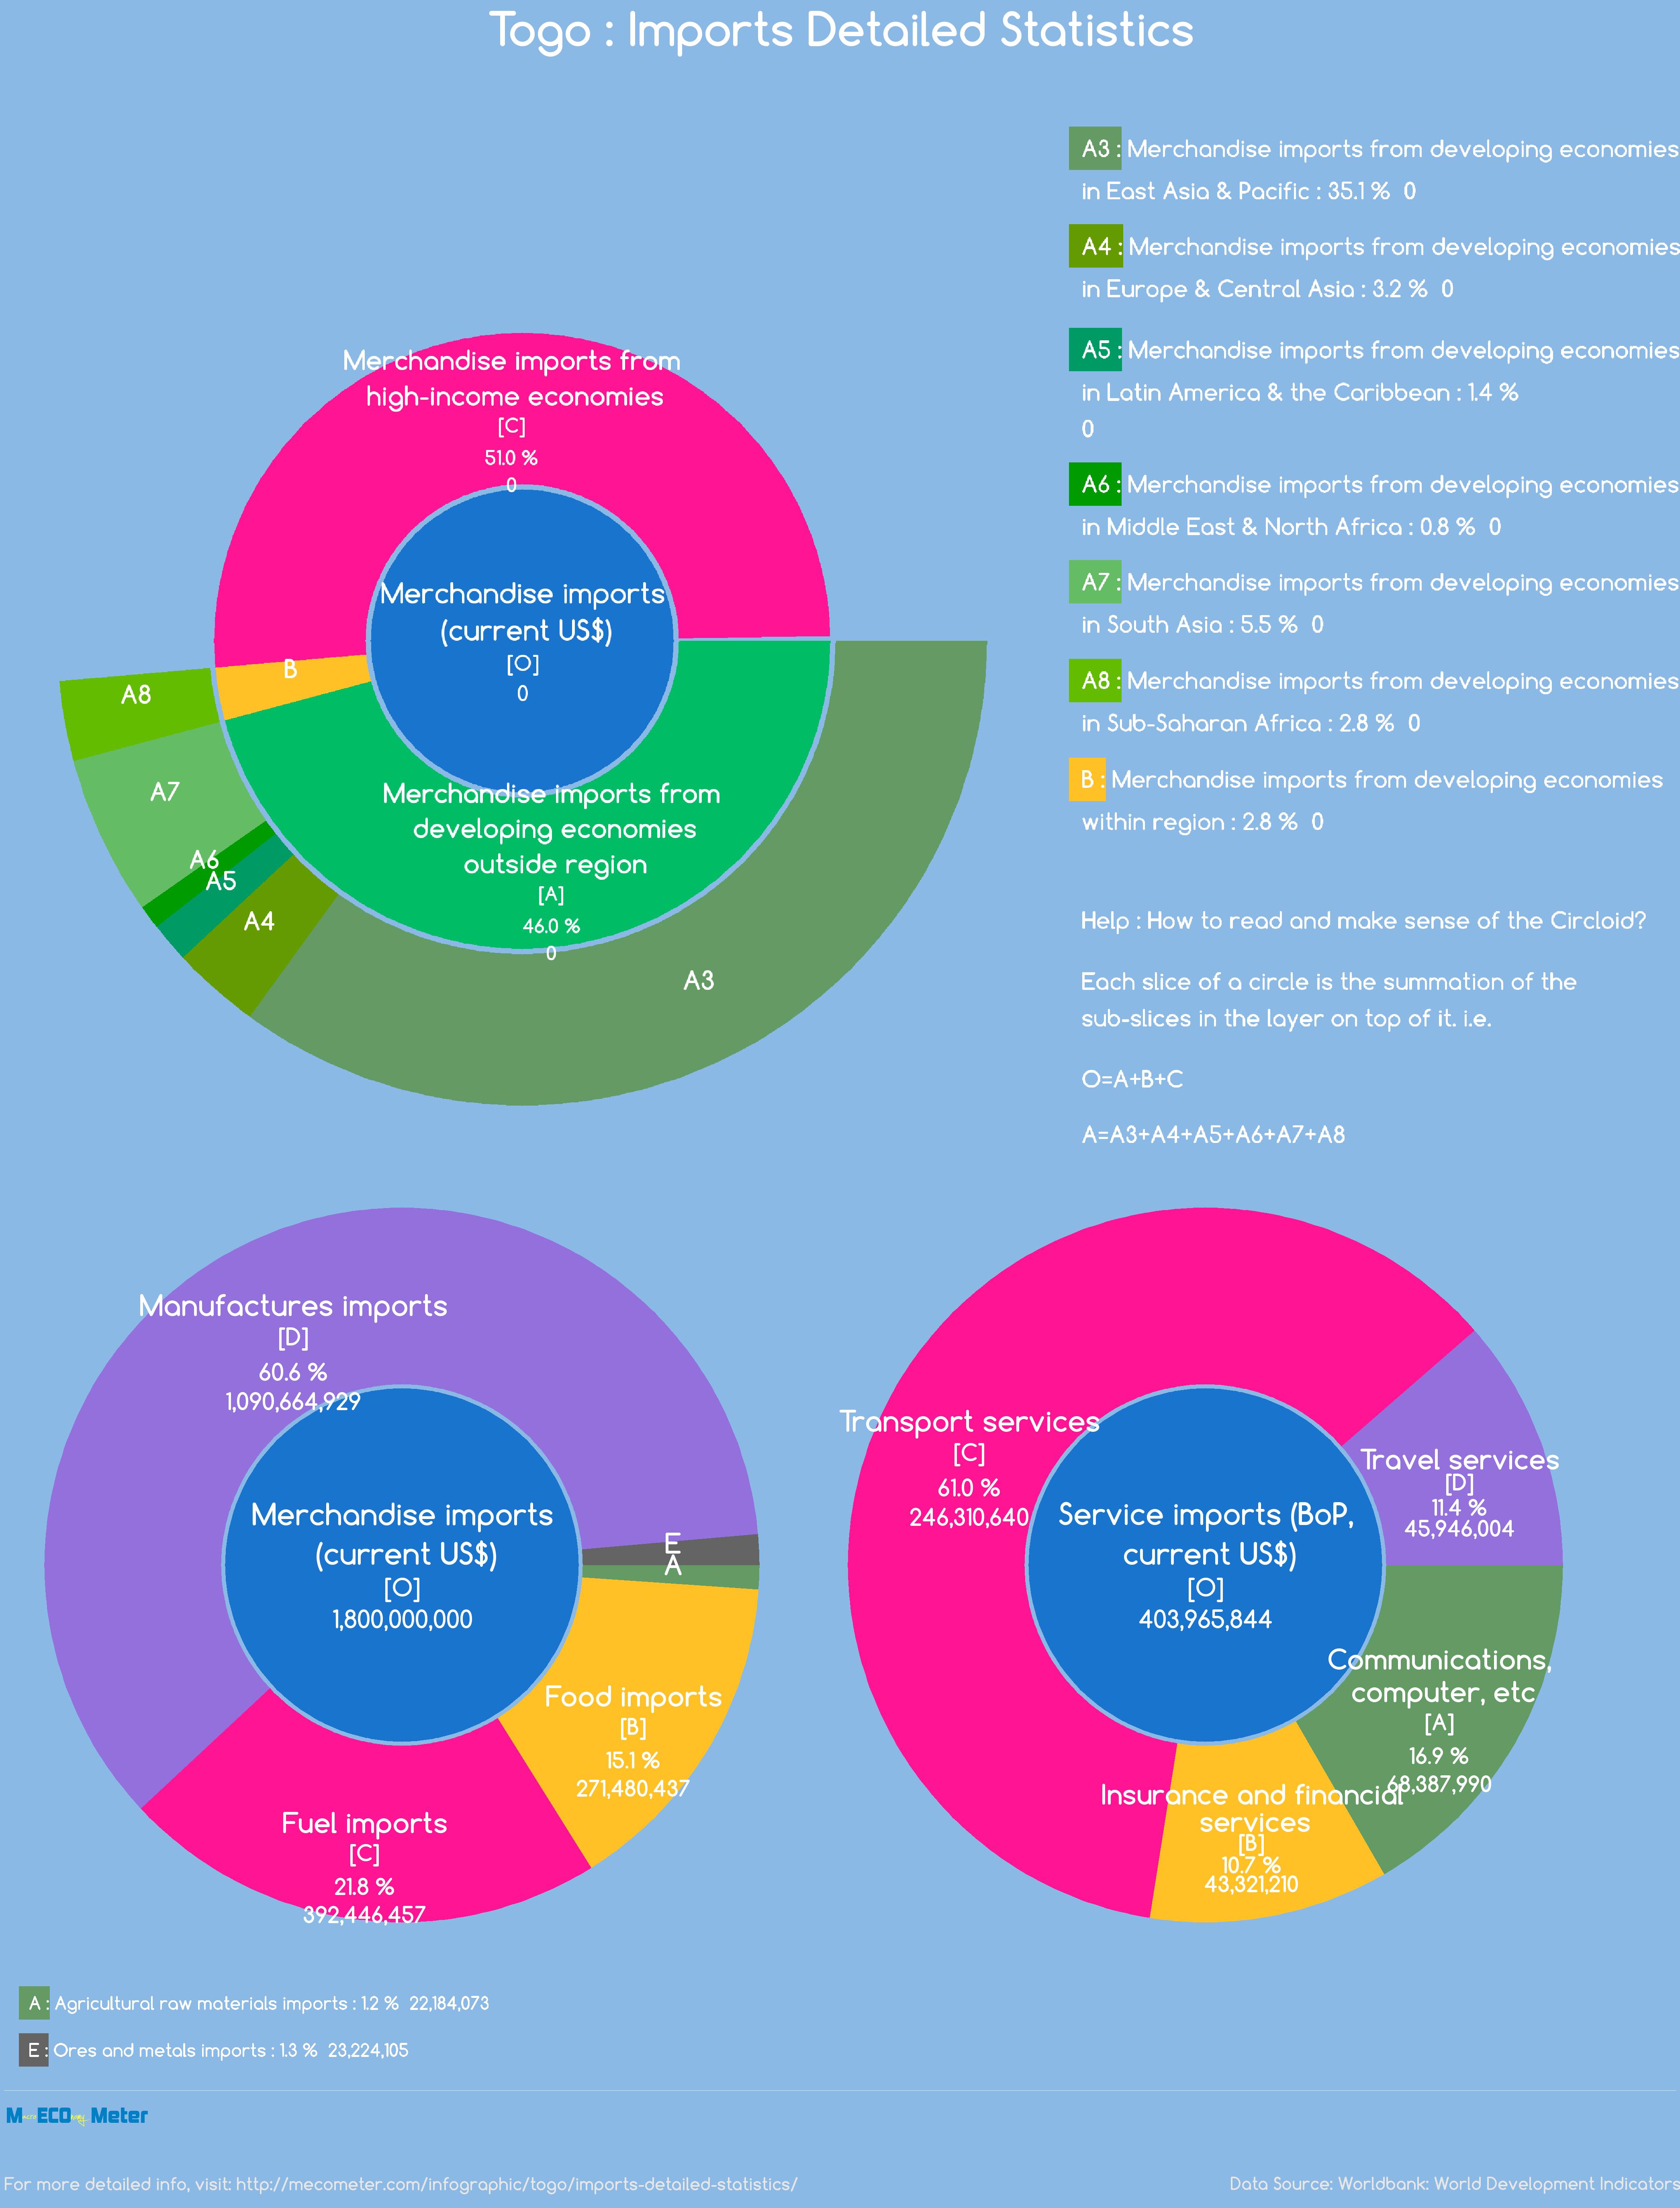 Togo : Imports Detailed Statistics